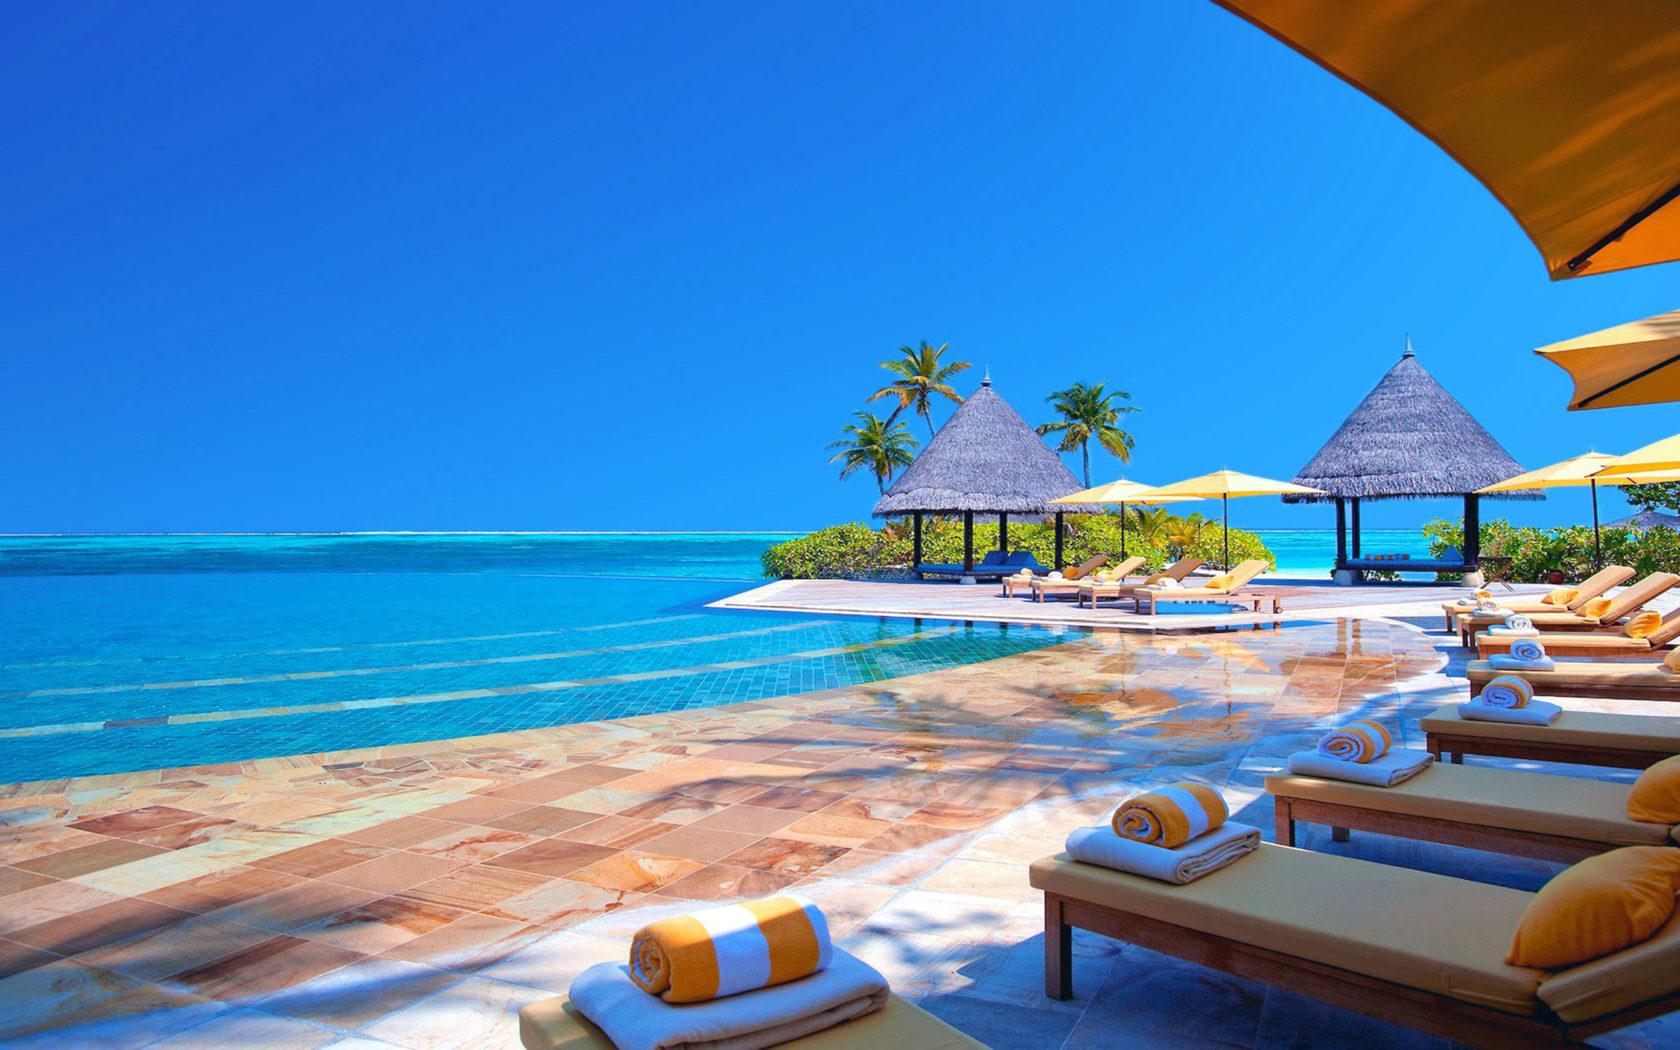 Surfer Girl Bali Wallpaper Hotel Terrace Chairs Ocean Maldives Hd Wallpaper 2560x1440